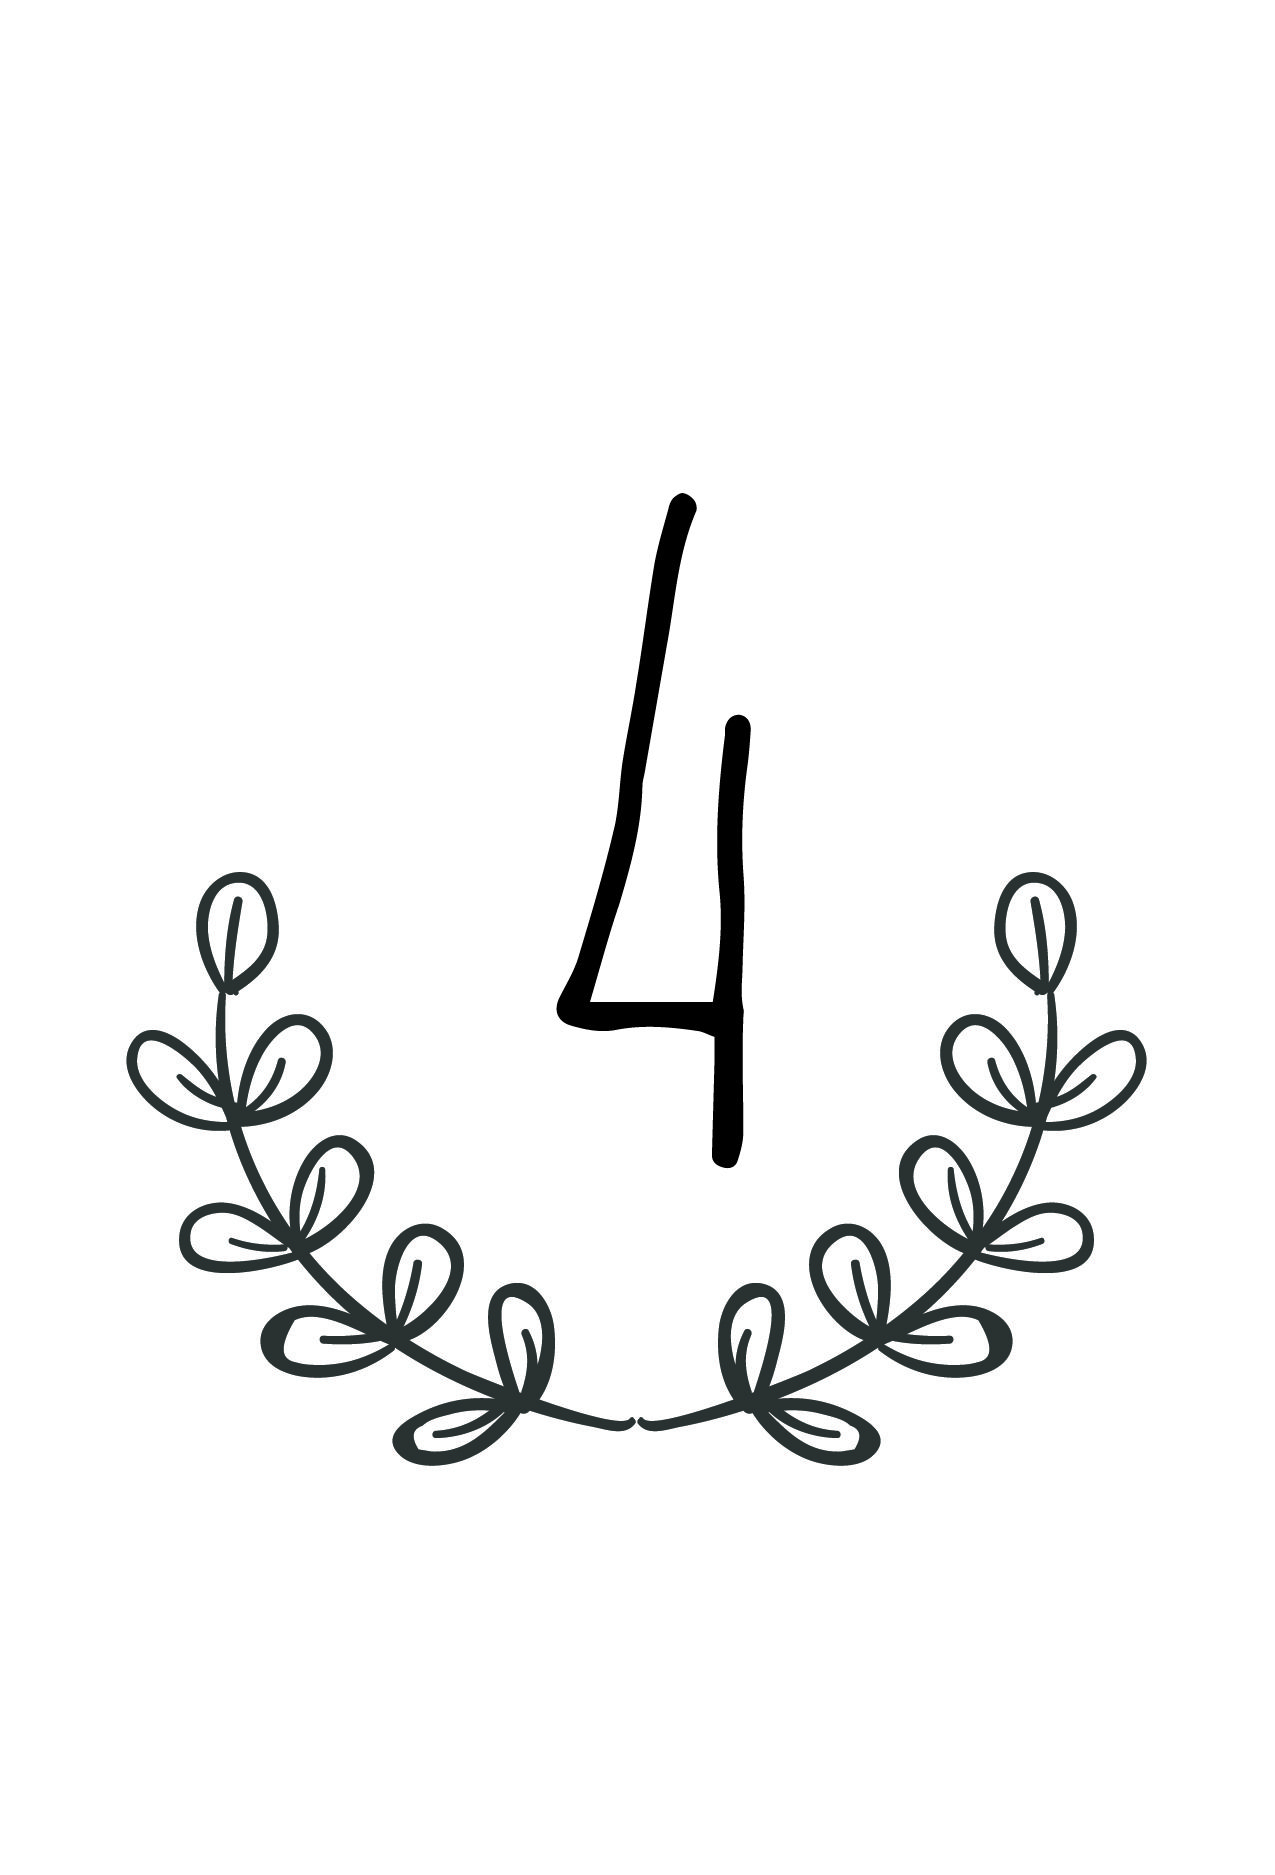 Free Rustic Wedding Table Number Printable | Future Wedding - Free Printable Table Numbers